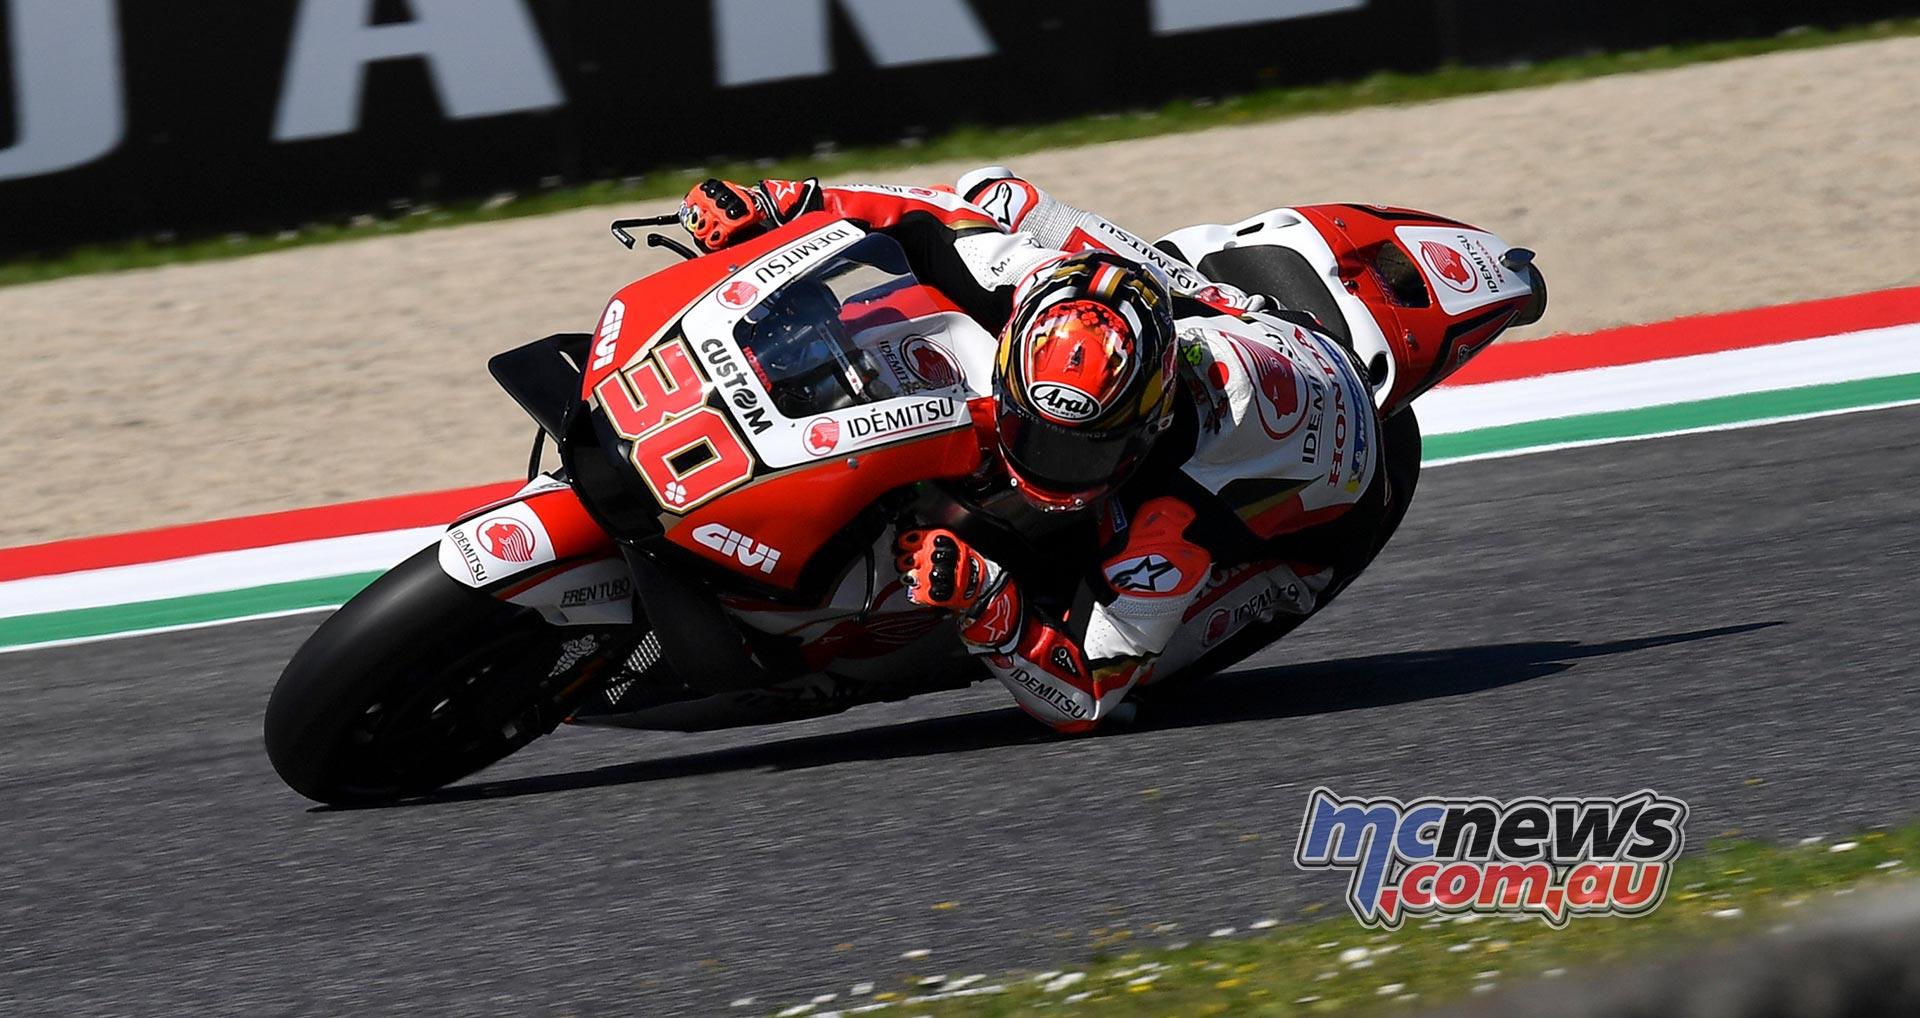 MotoGP Rnd Mugello Race Nakagami